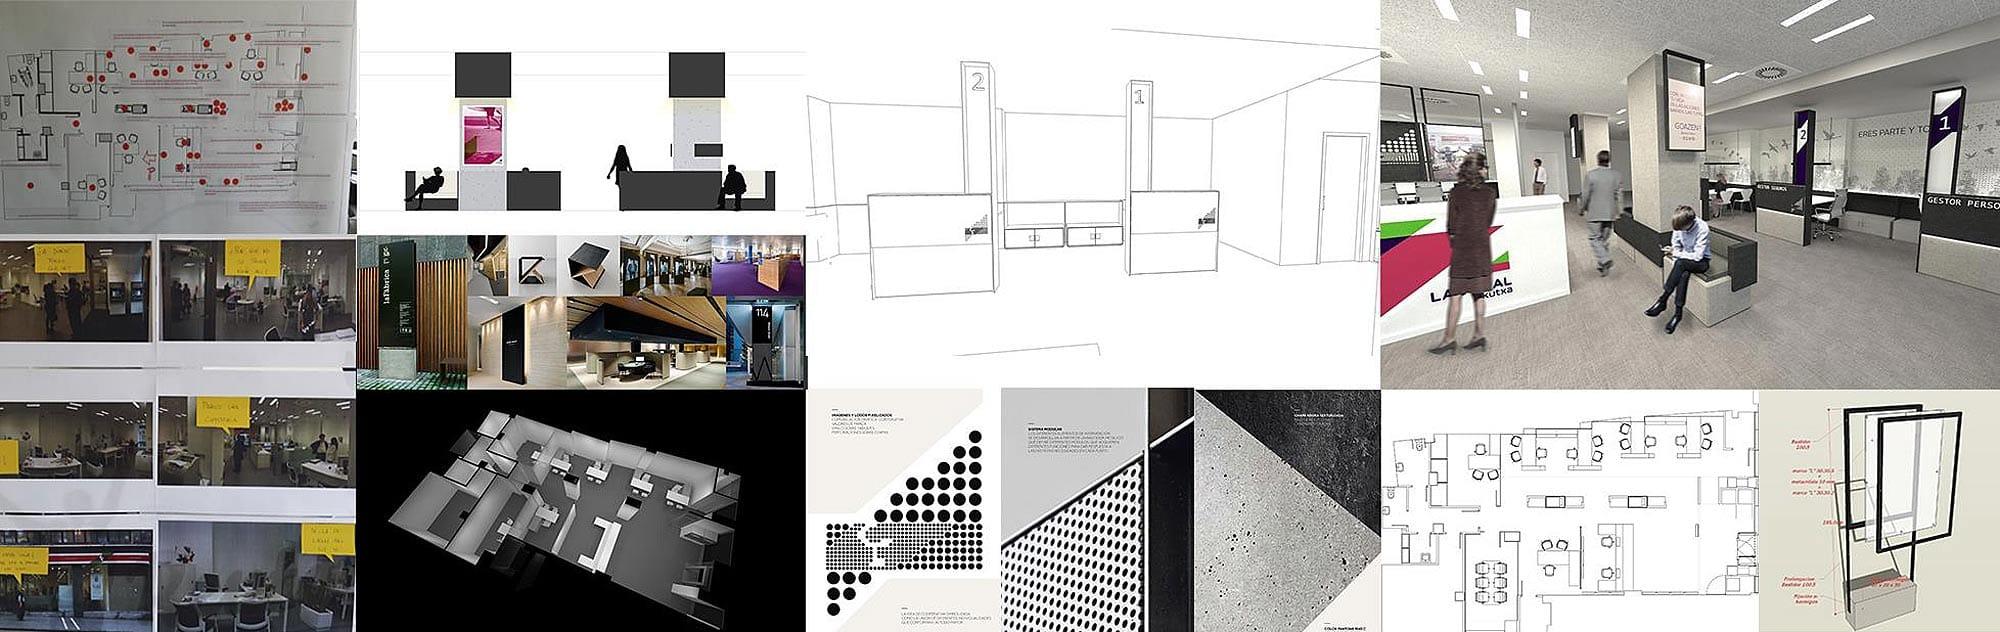 Laboral kutxa dise o del modelo de oficina flow the for Caja laboral valladolid oficinas